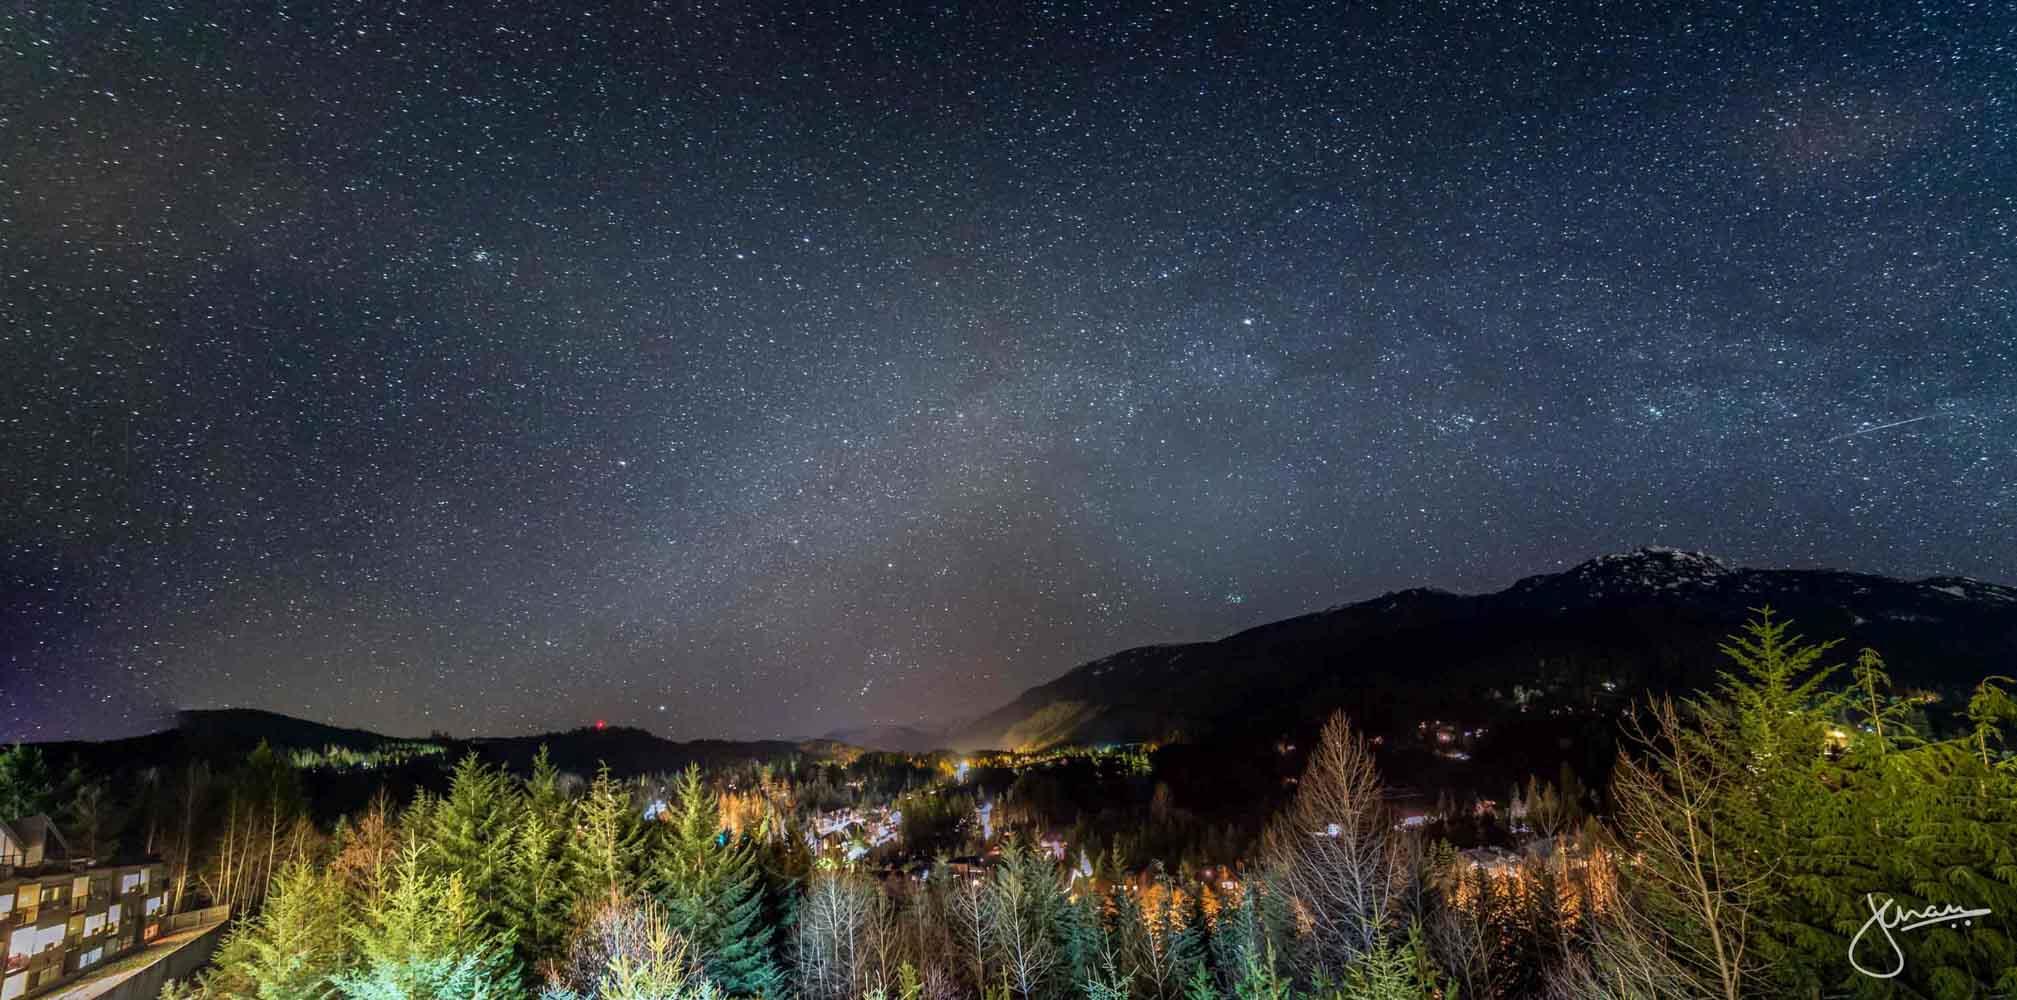 Beautiful Milky Way seen over Nita Lake, Whistler